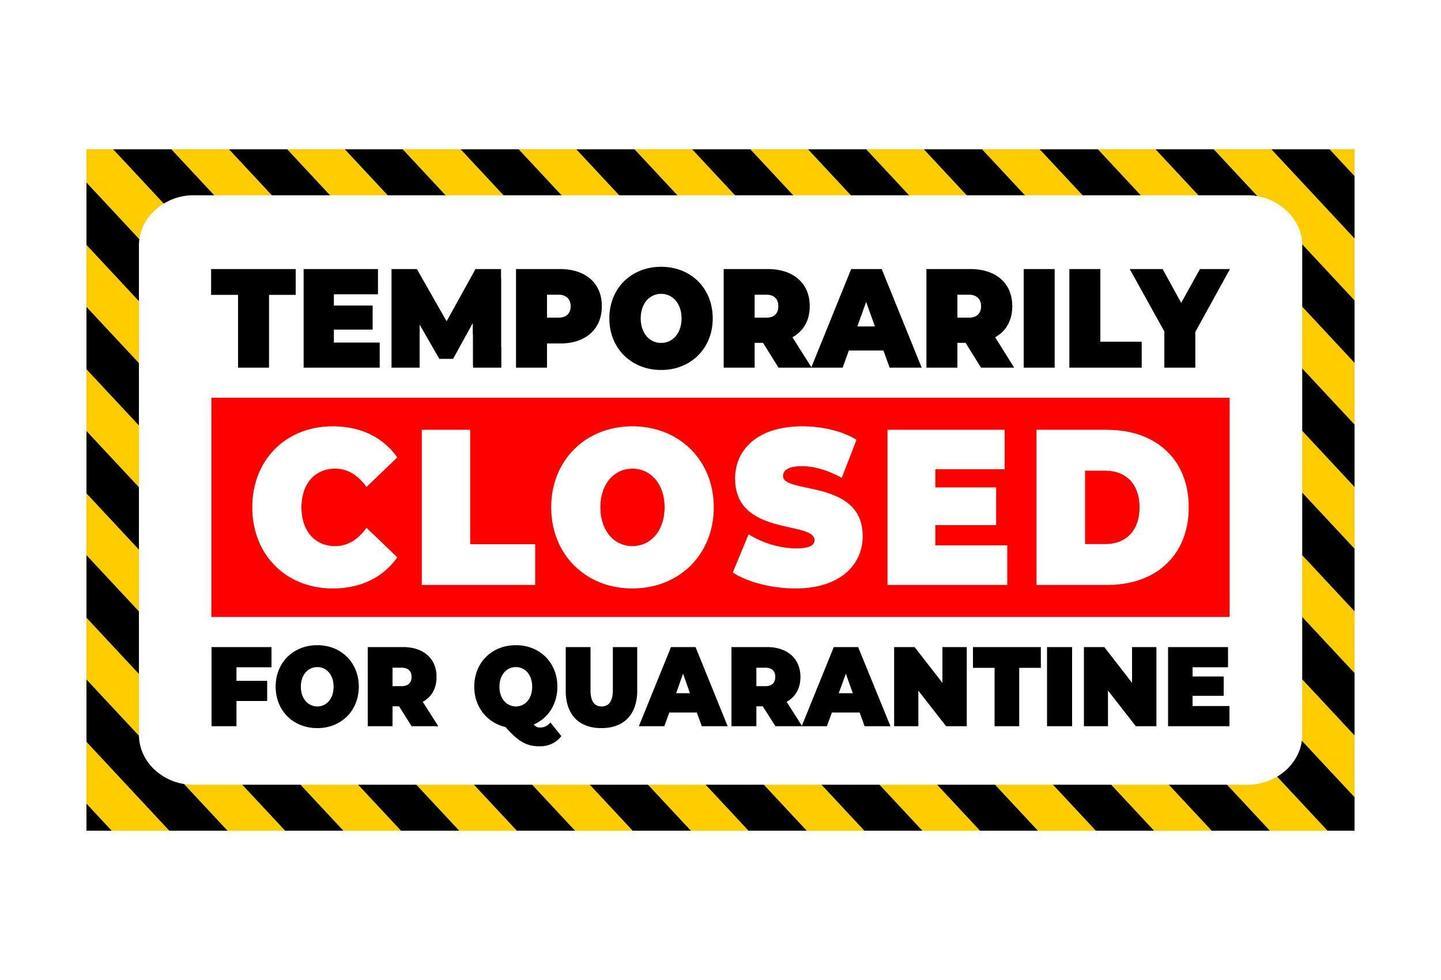 temporarily closed for quarantine vector